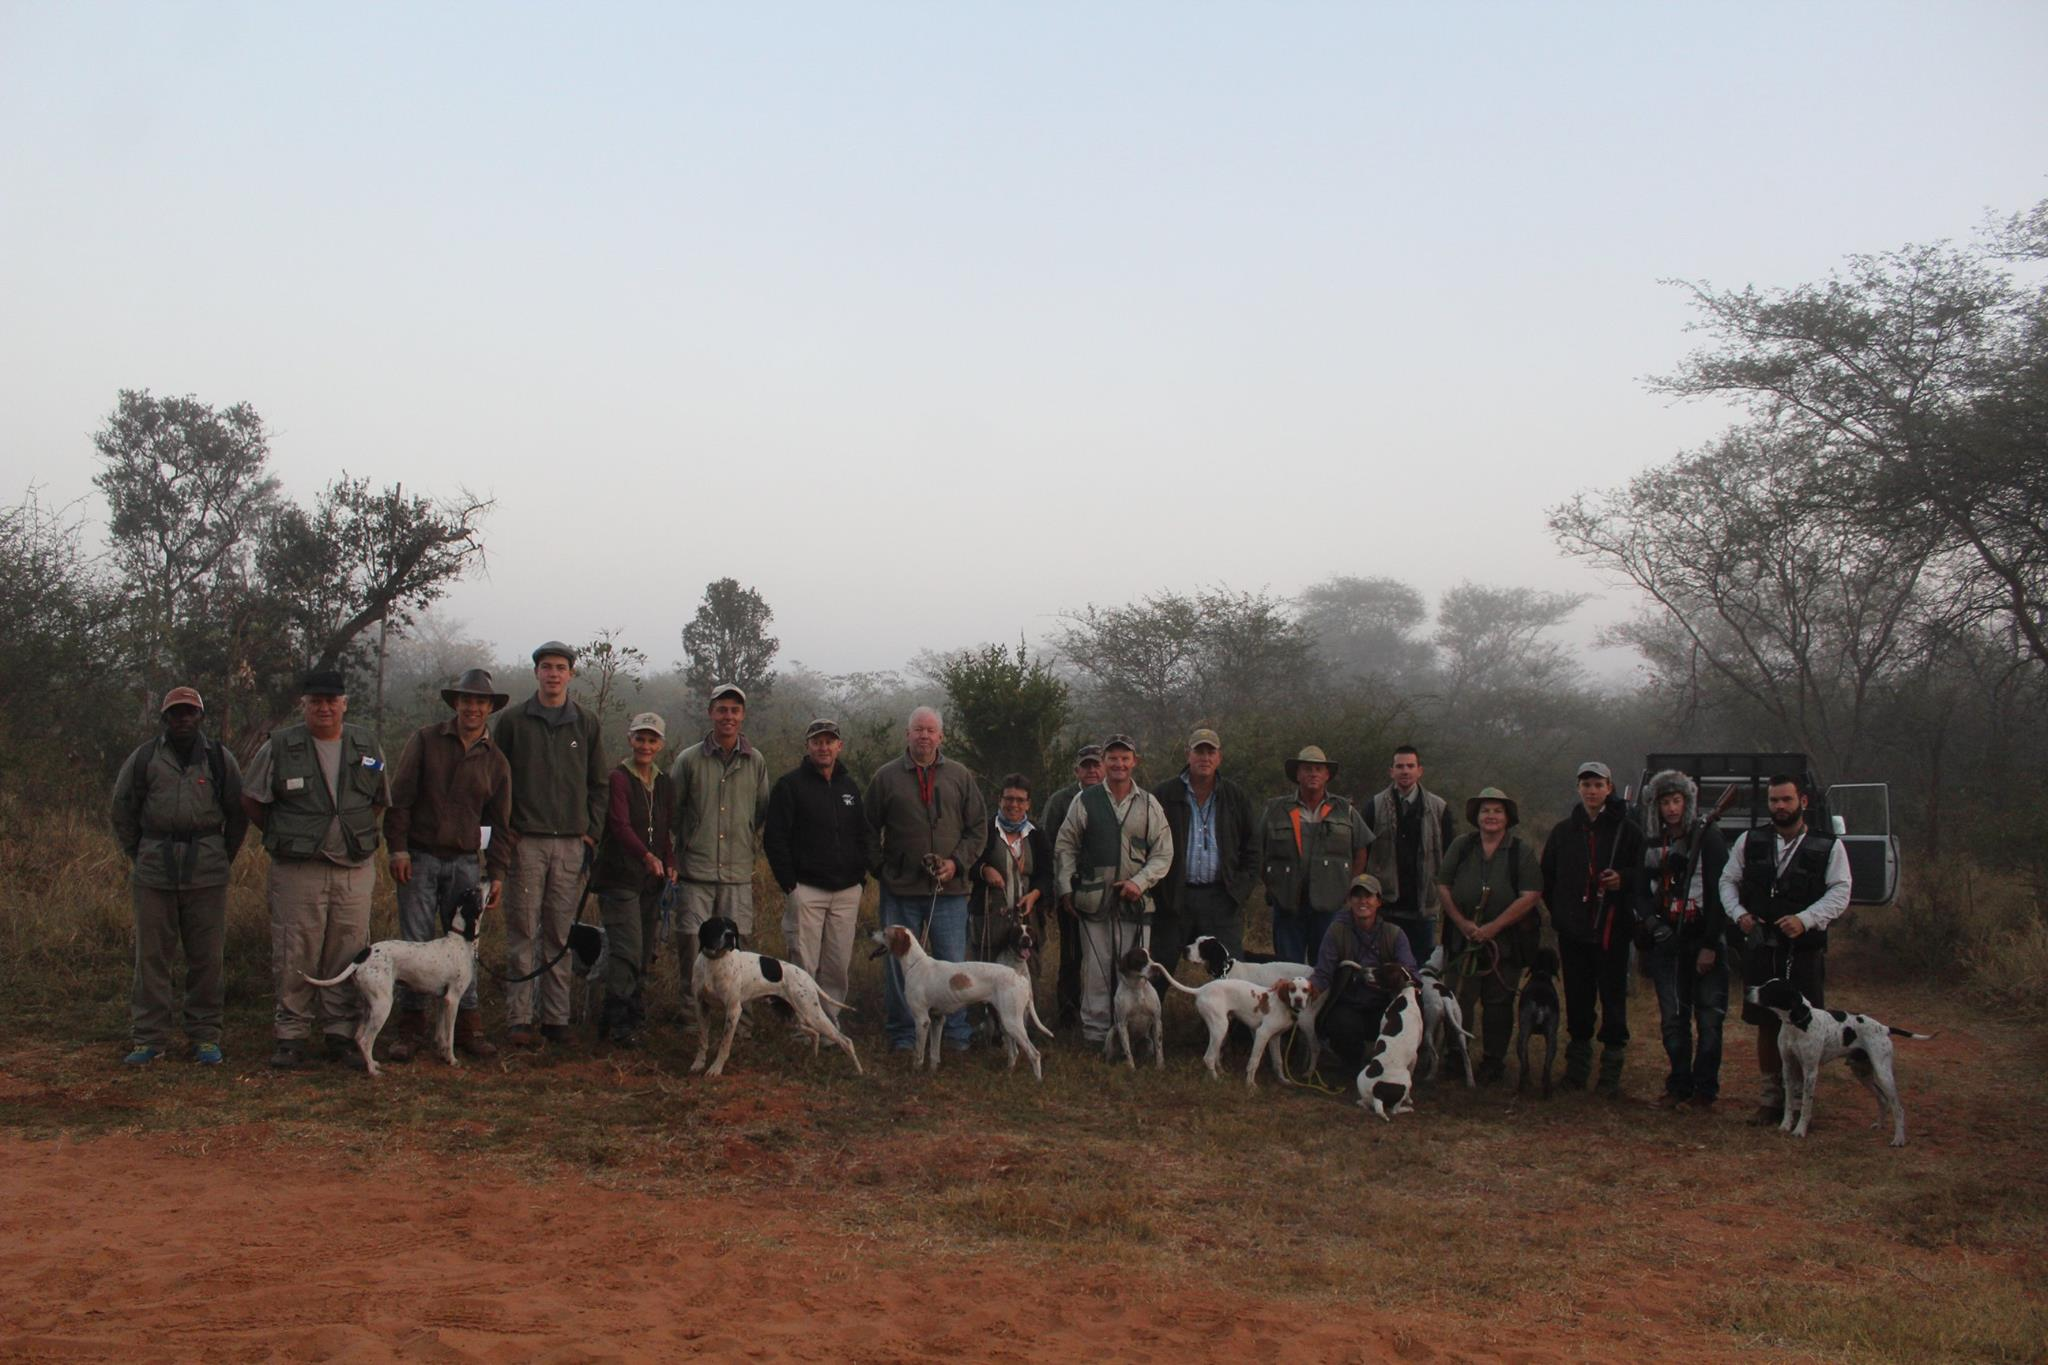 10th Zimbabwe National Pointer Dog Trials